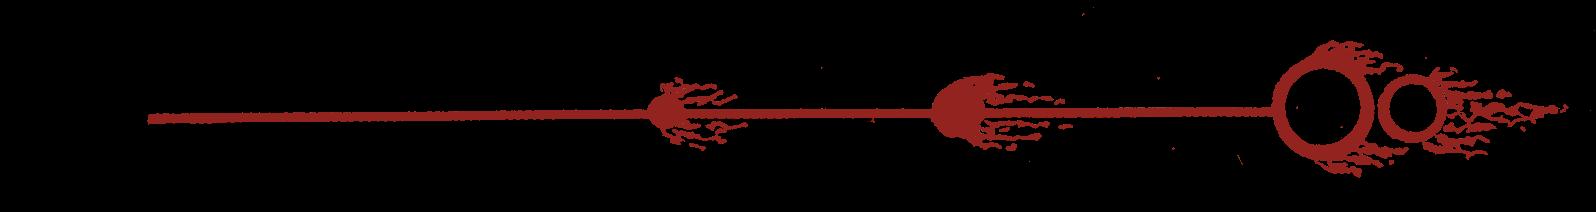 long-glyph2-red